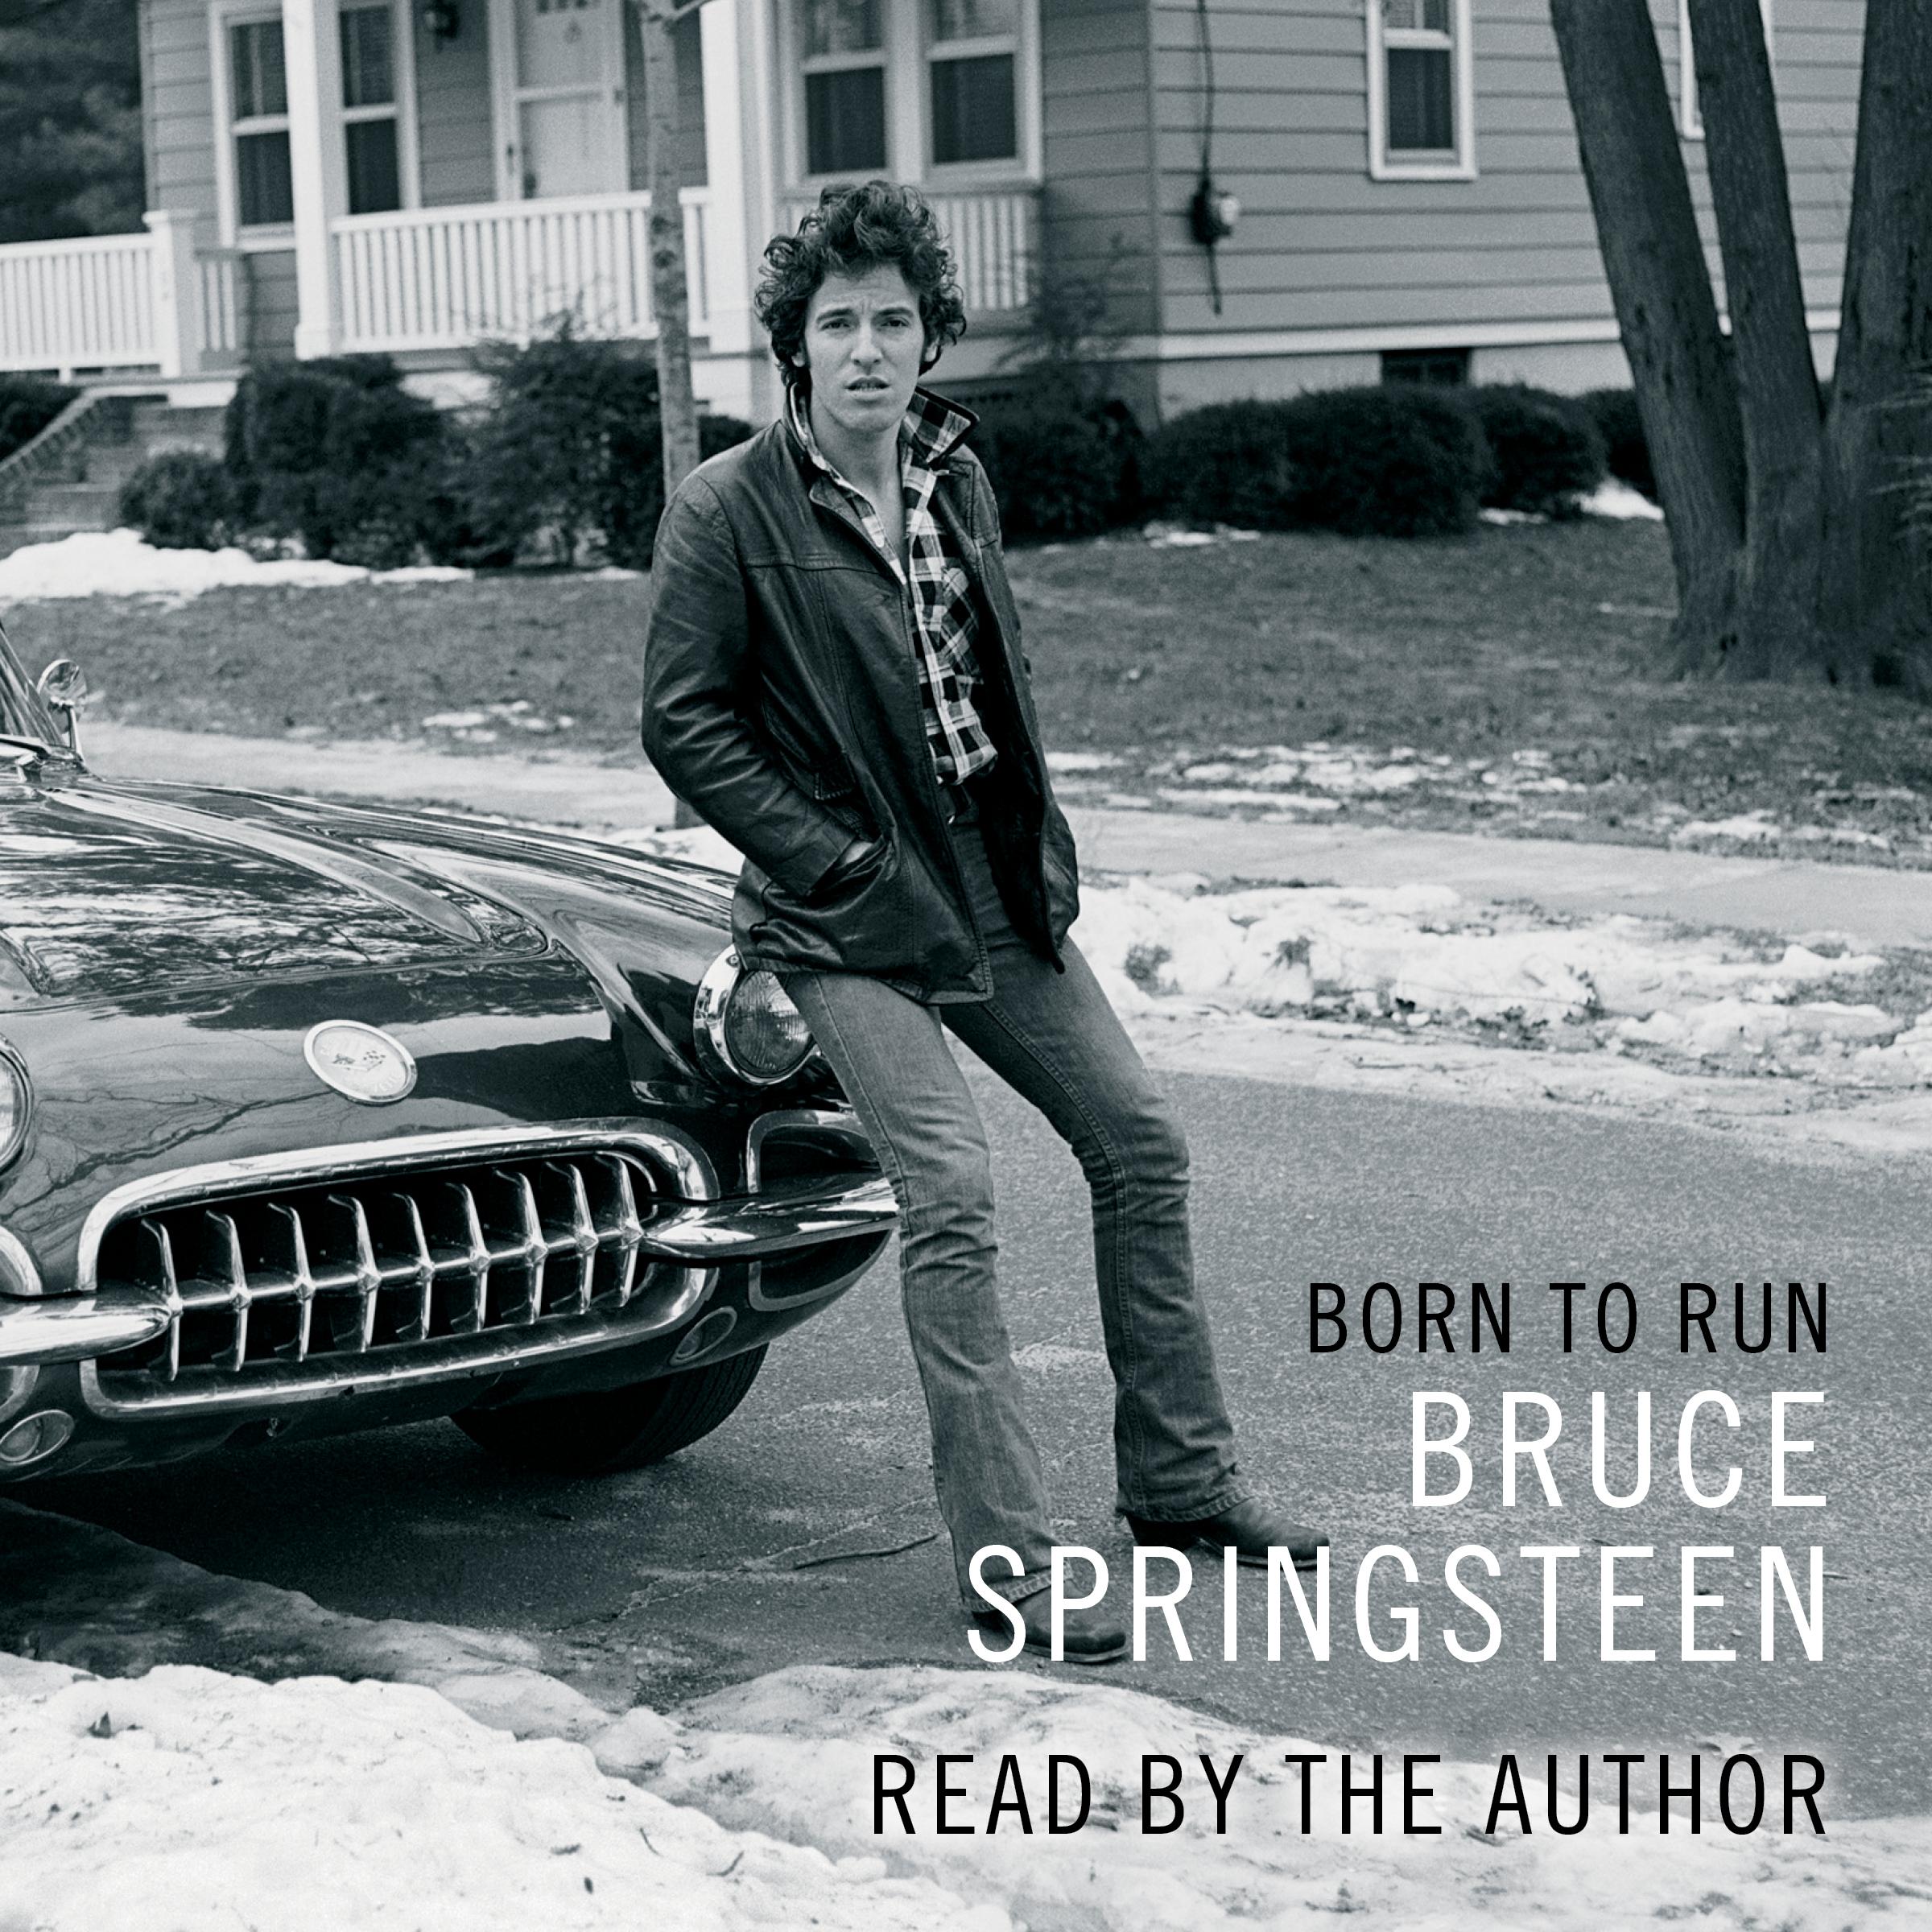 Born to run 9781508224235 hr